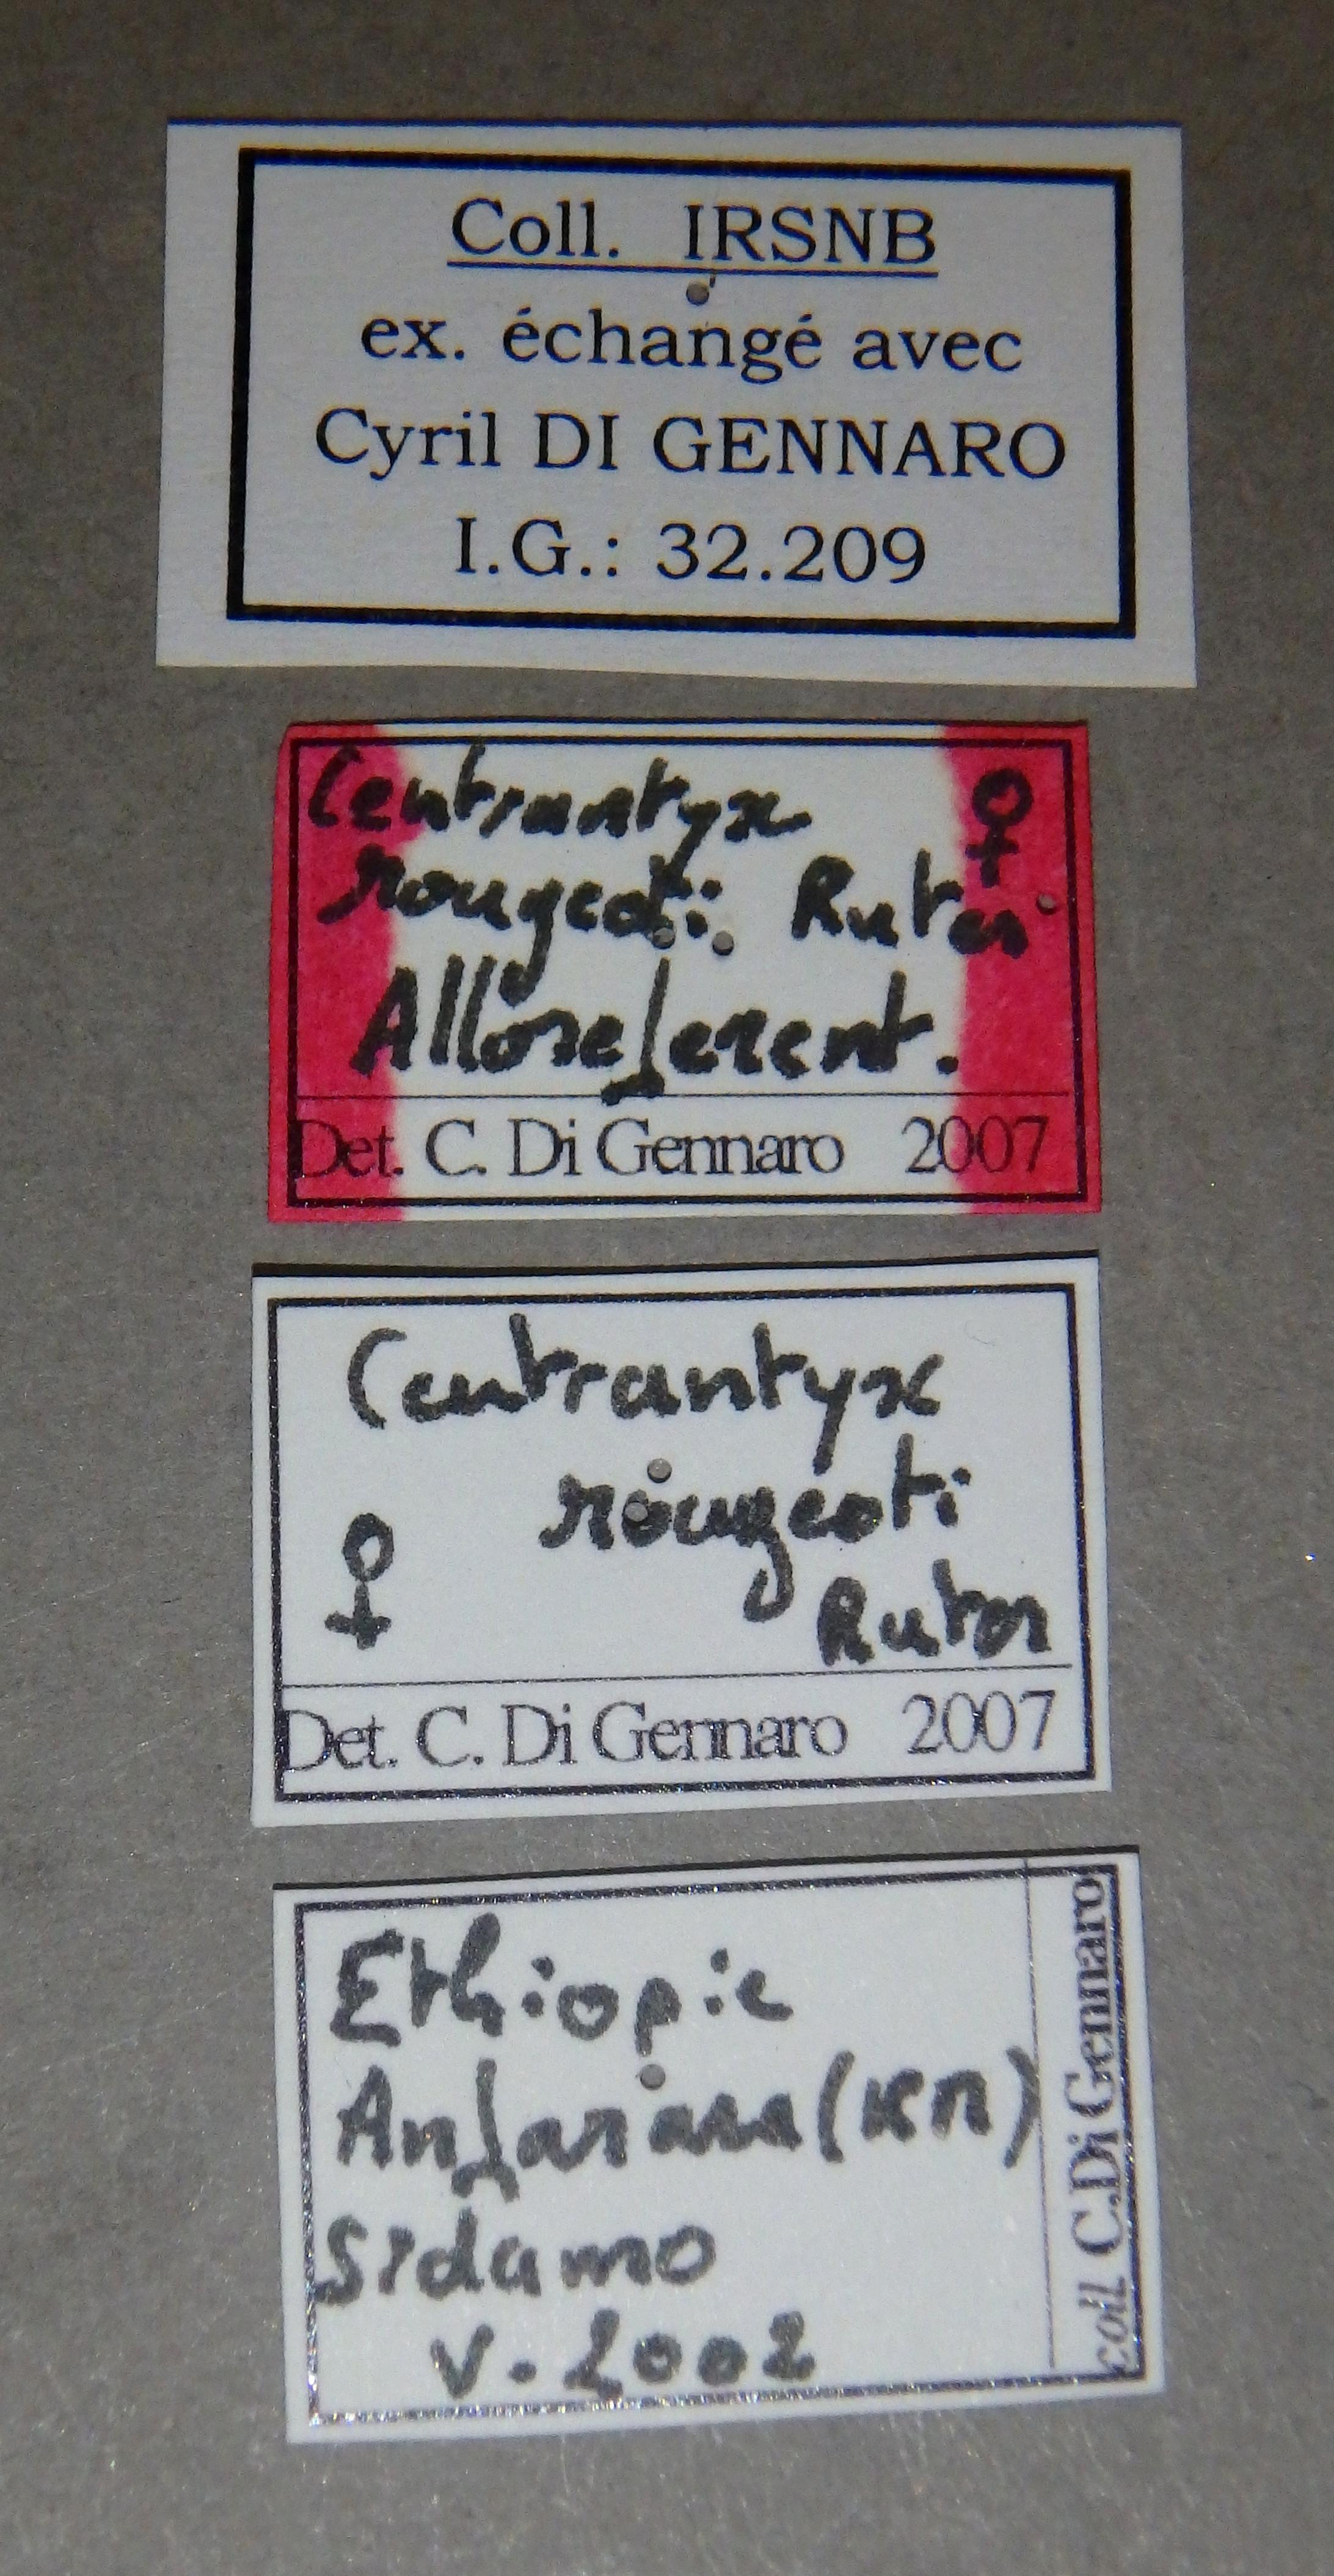 Centrantyx (Nigrocentrantyx) rougeoti rougeoti at Lb.JPG